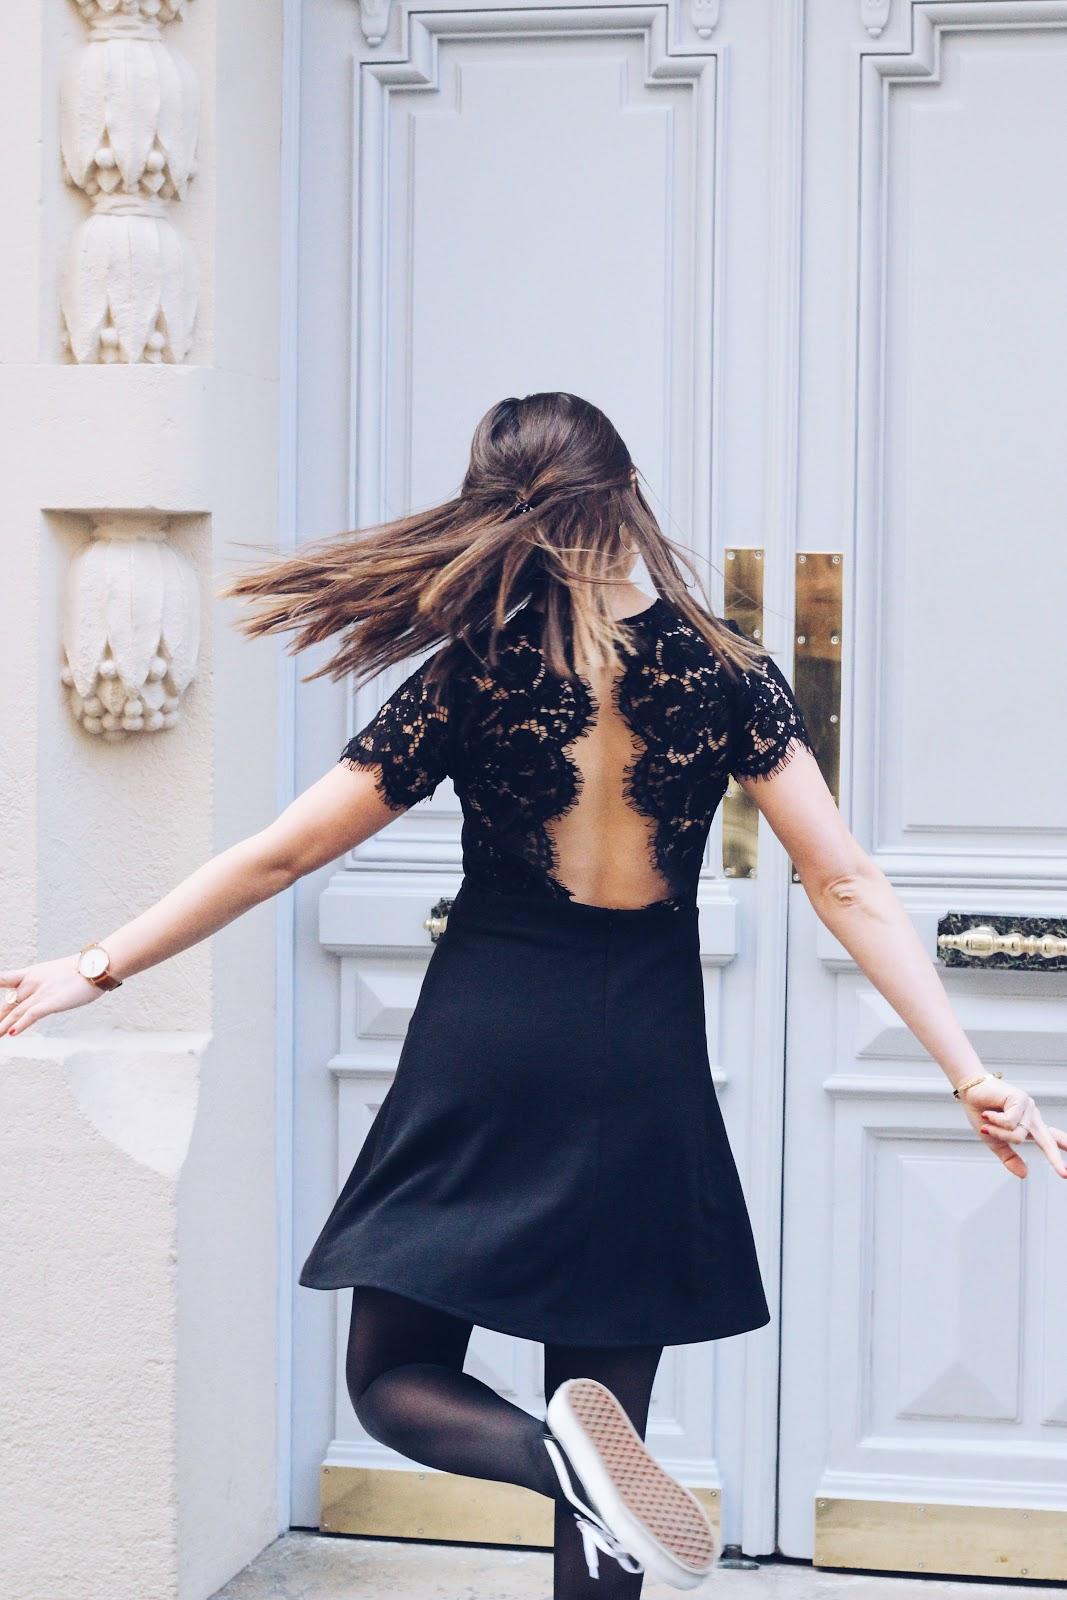 chic and clothes blog mode paris toulouse fashion website. Black Bedroom Furniture Sets. Home Design Ideas